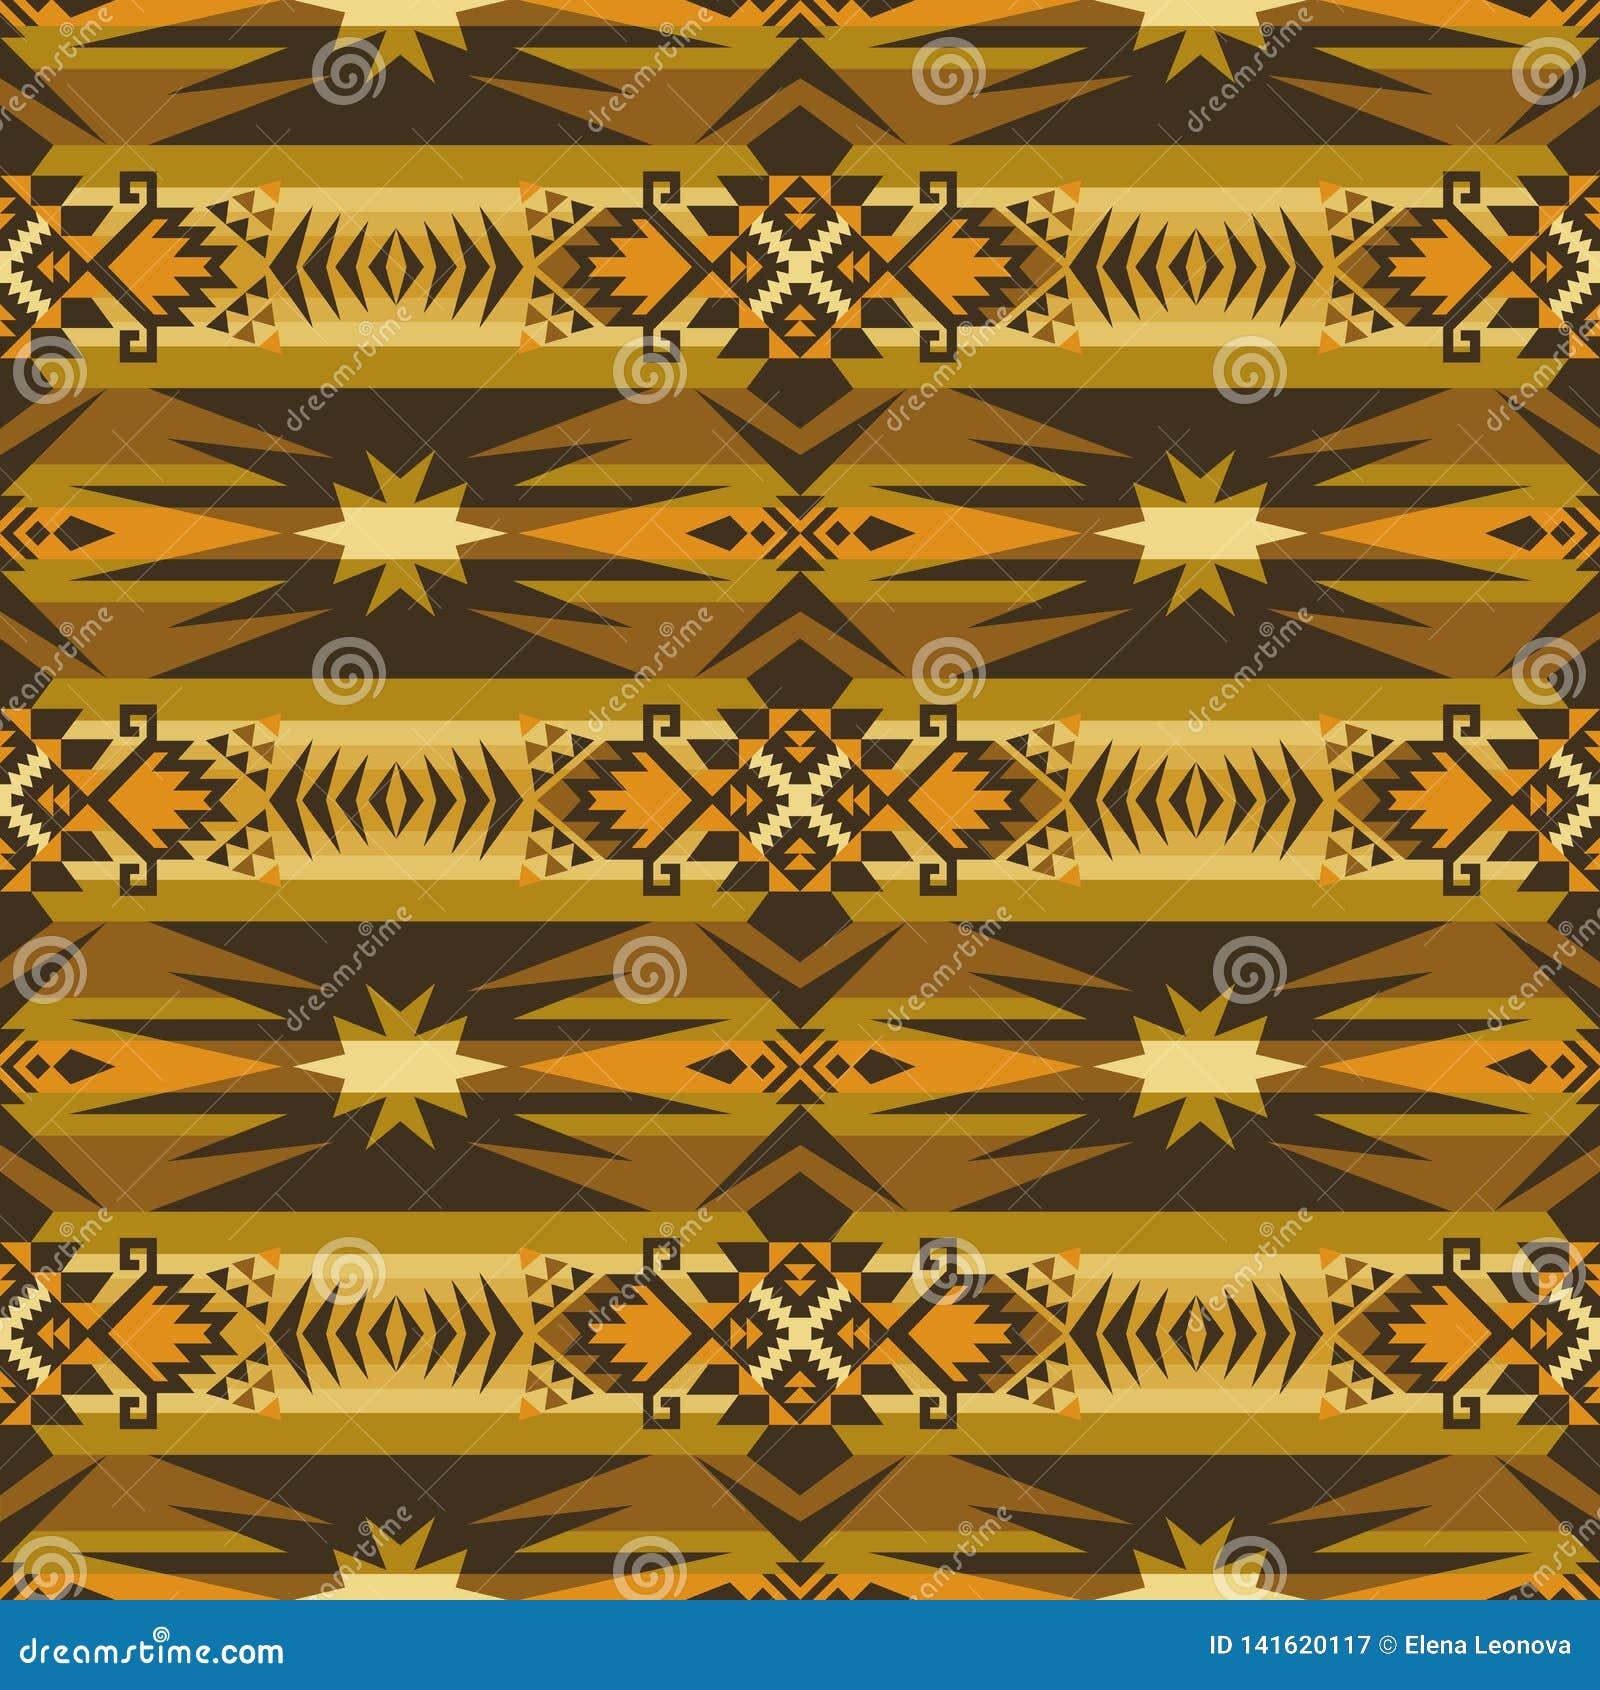 Native Southwest American Indian Aztec Navajo Seamless Pattern